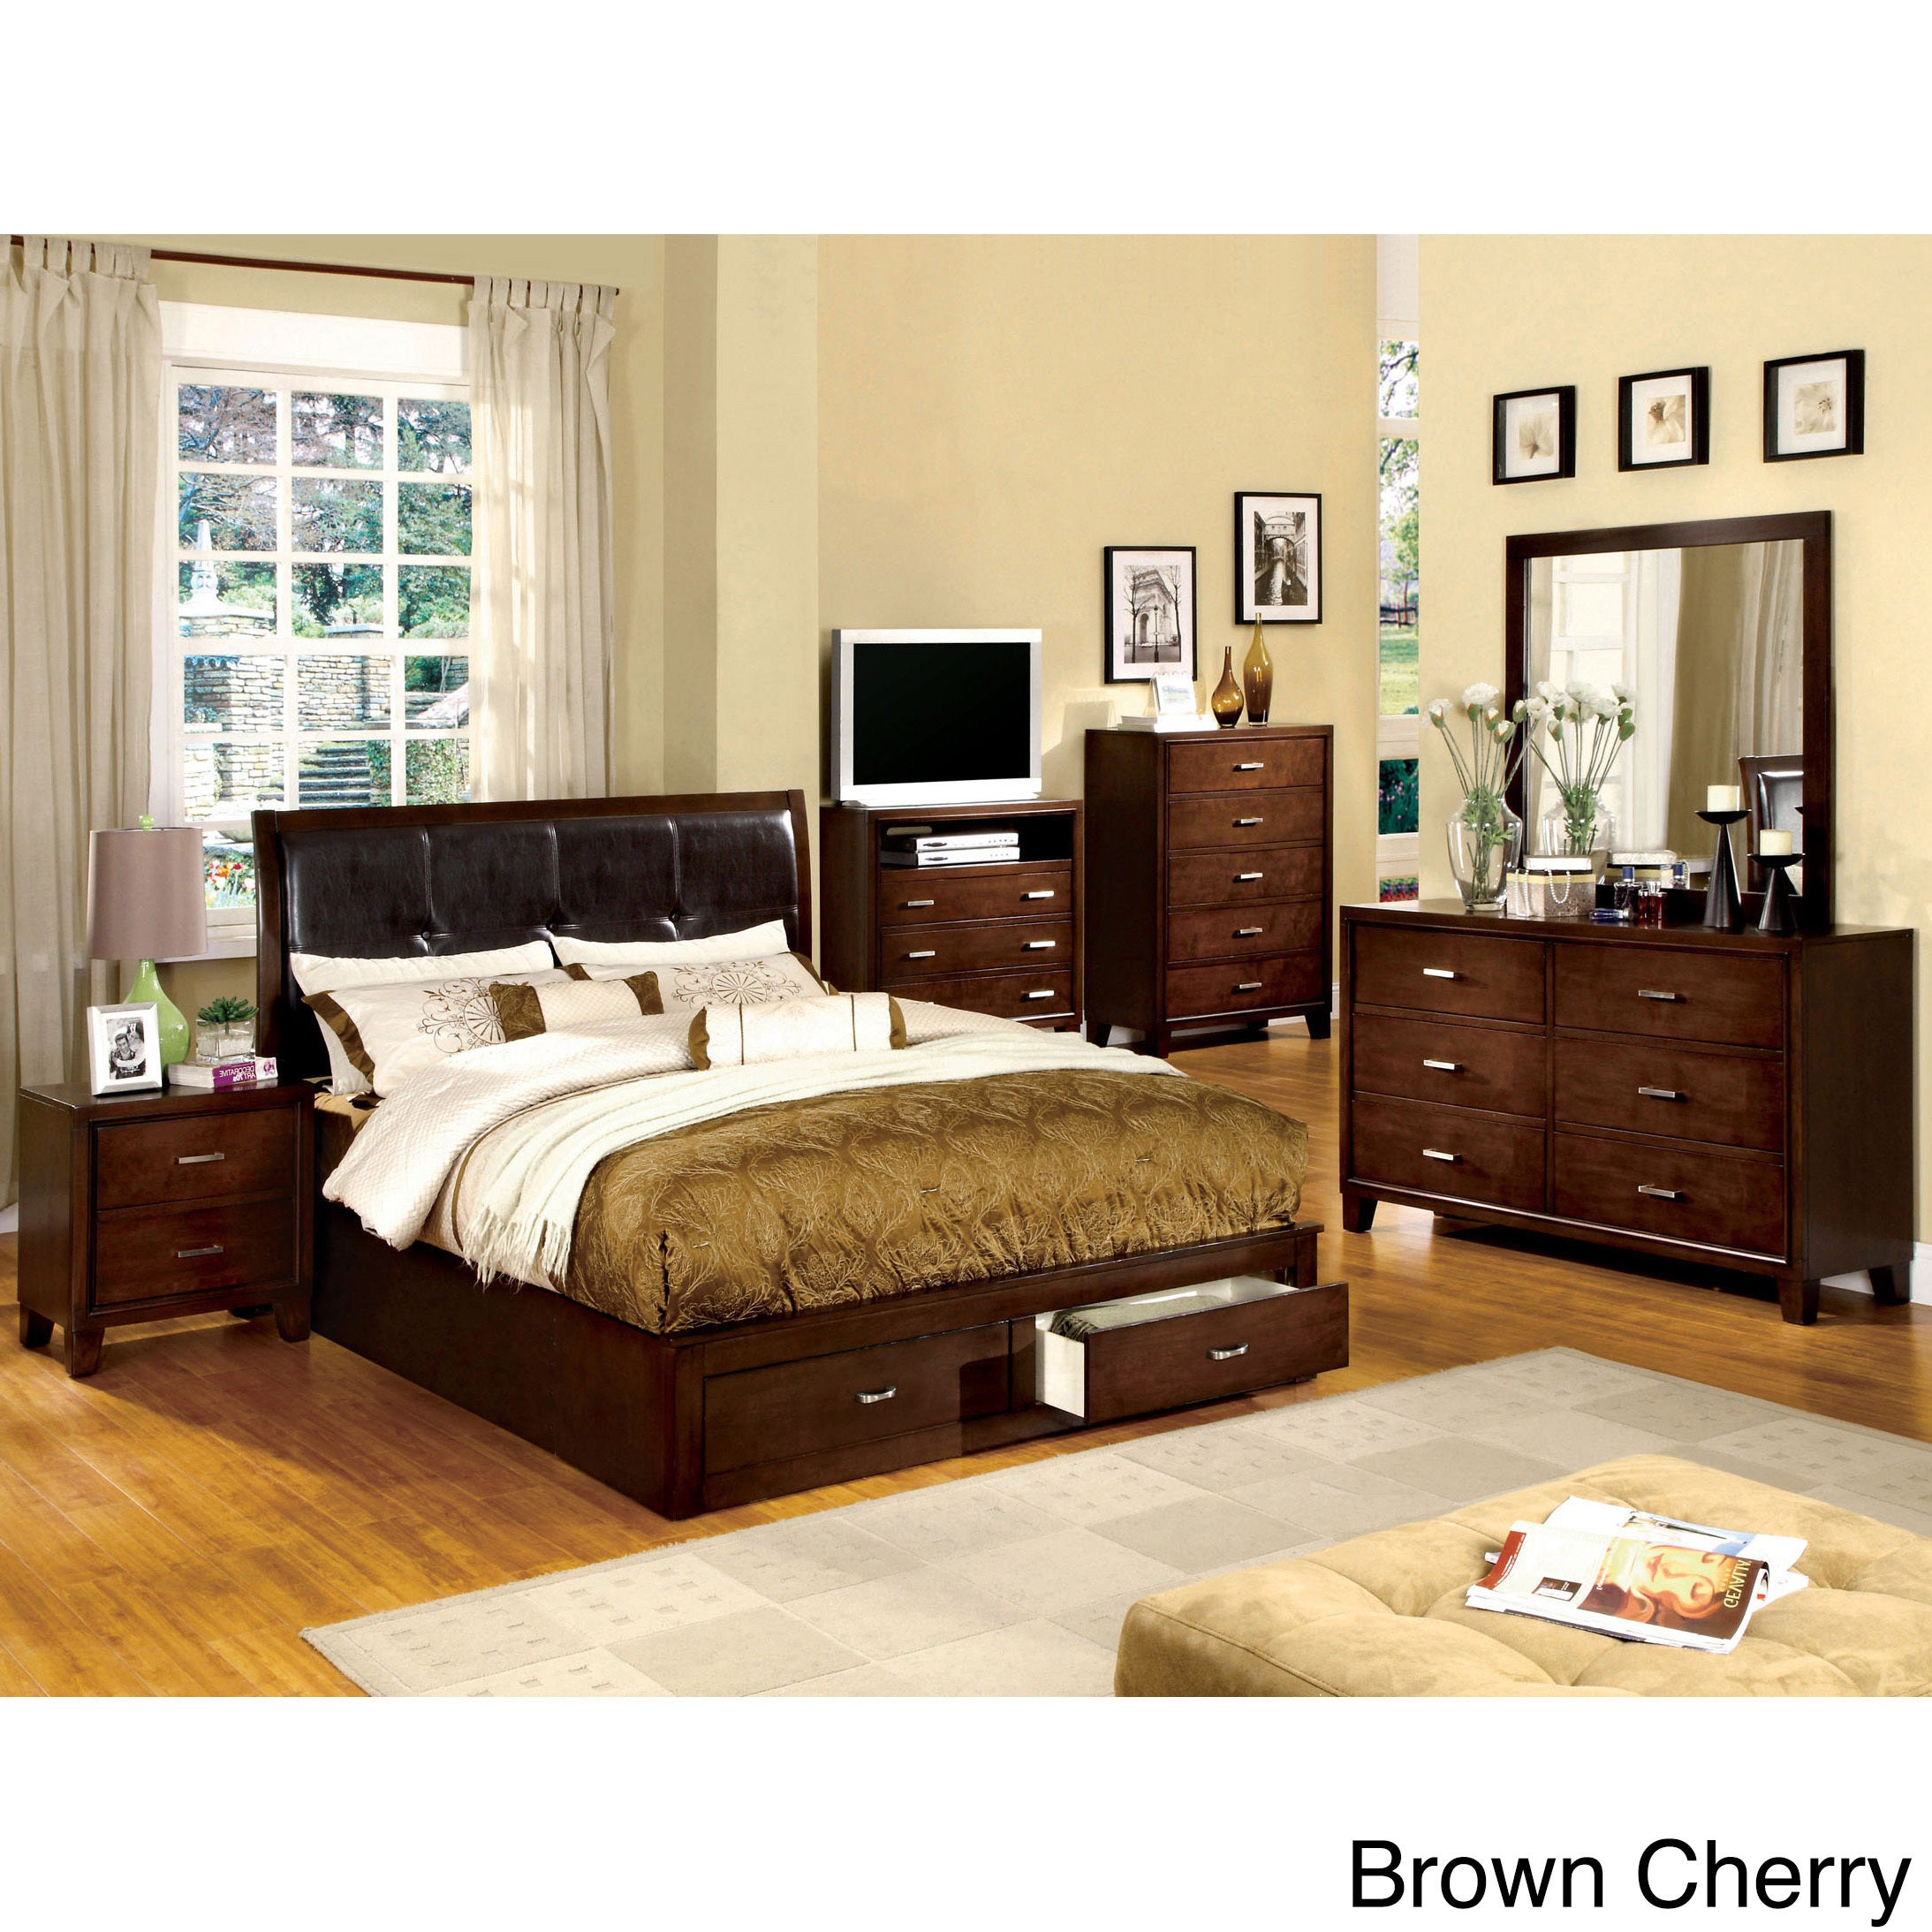 Furniture of America York Storage Platform Bed (Queen - B...